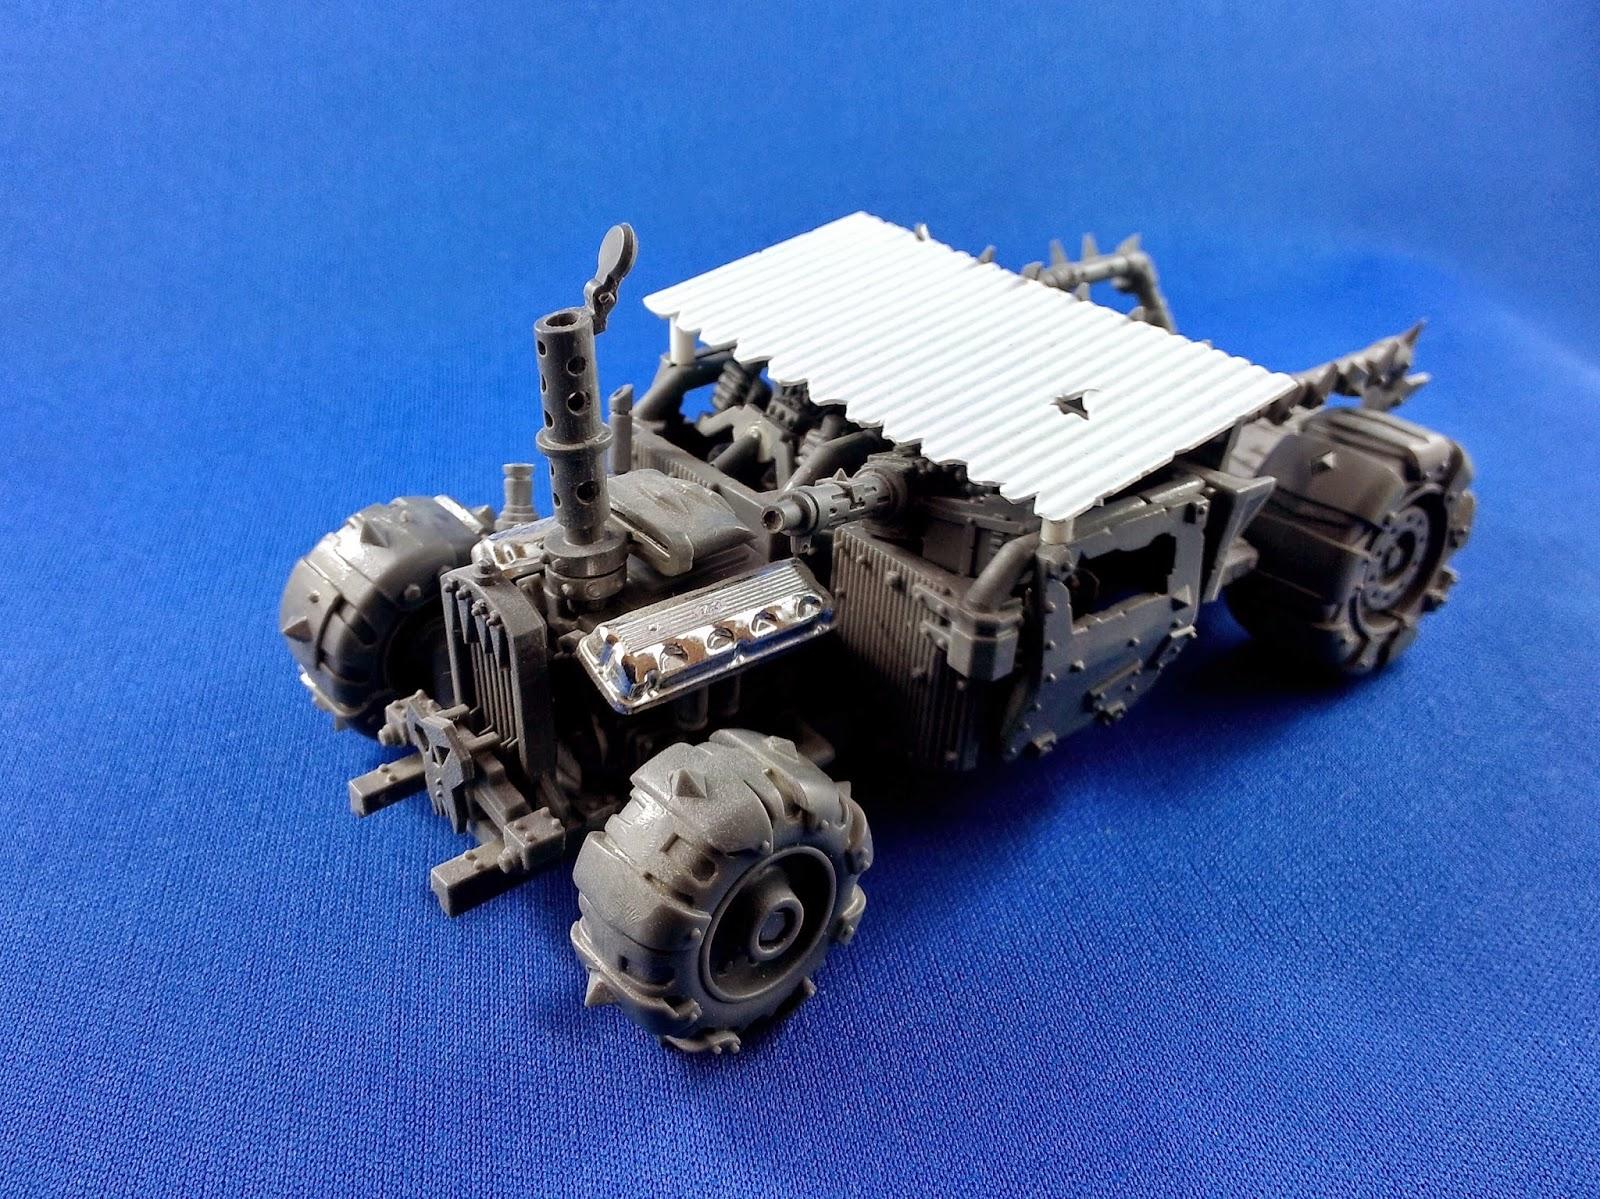 The Miniature Apocalypse: Ork Trukk - Rat Rod conversion part 1